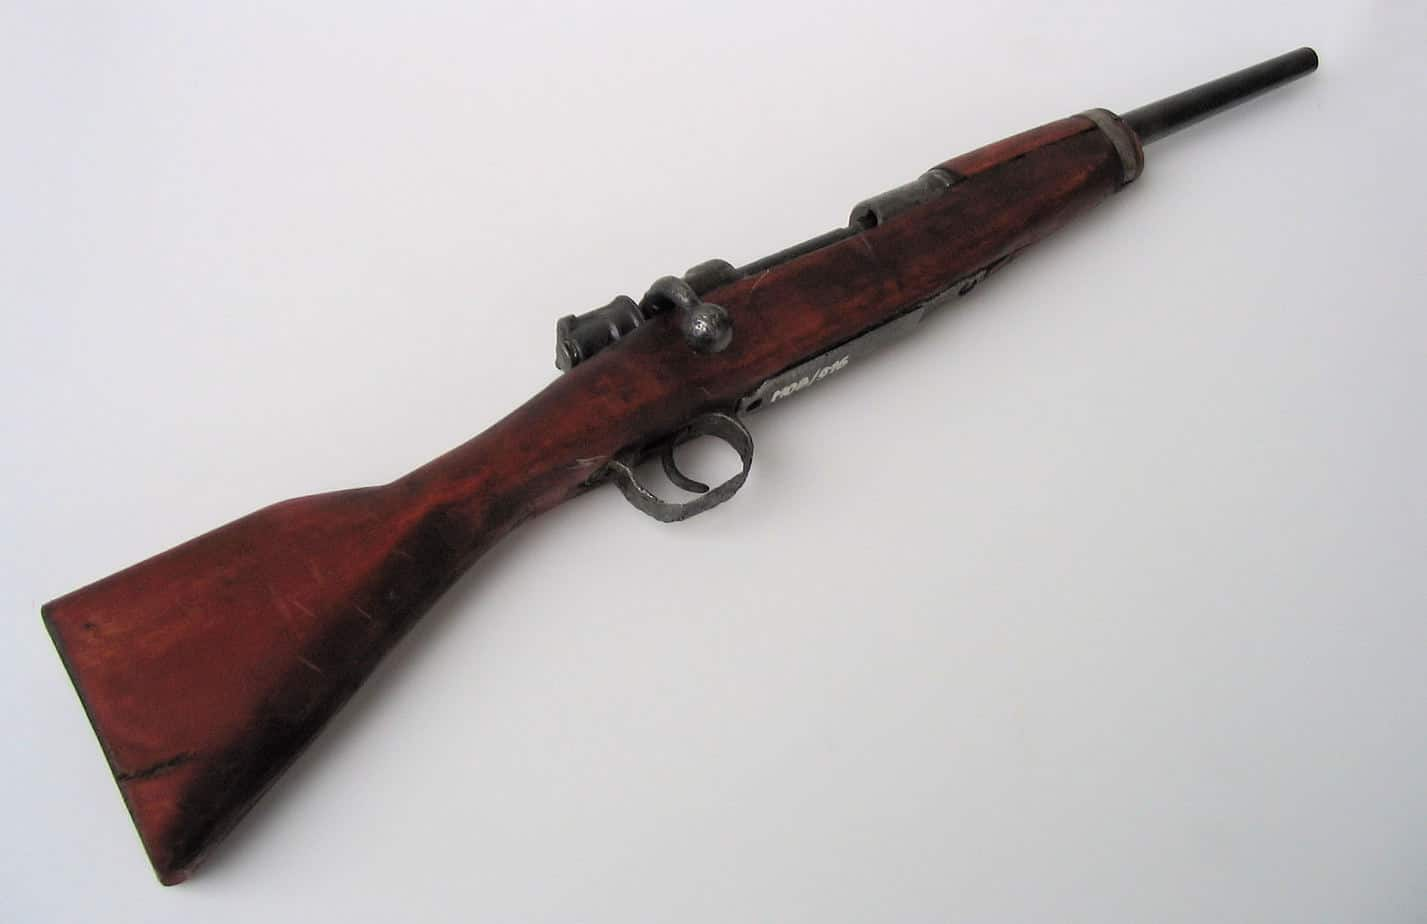 Are Sawed Off Shotguns Legal